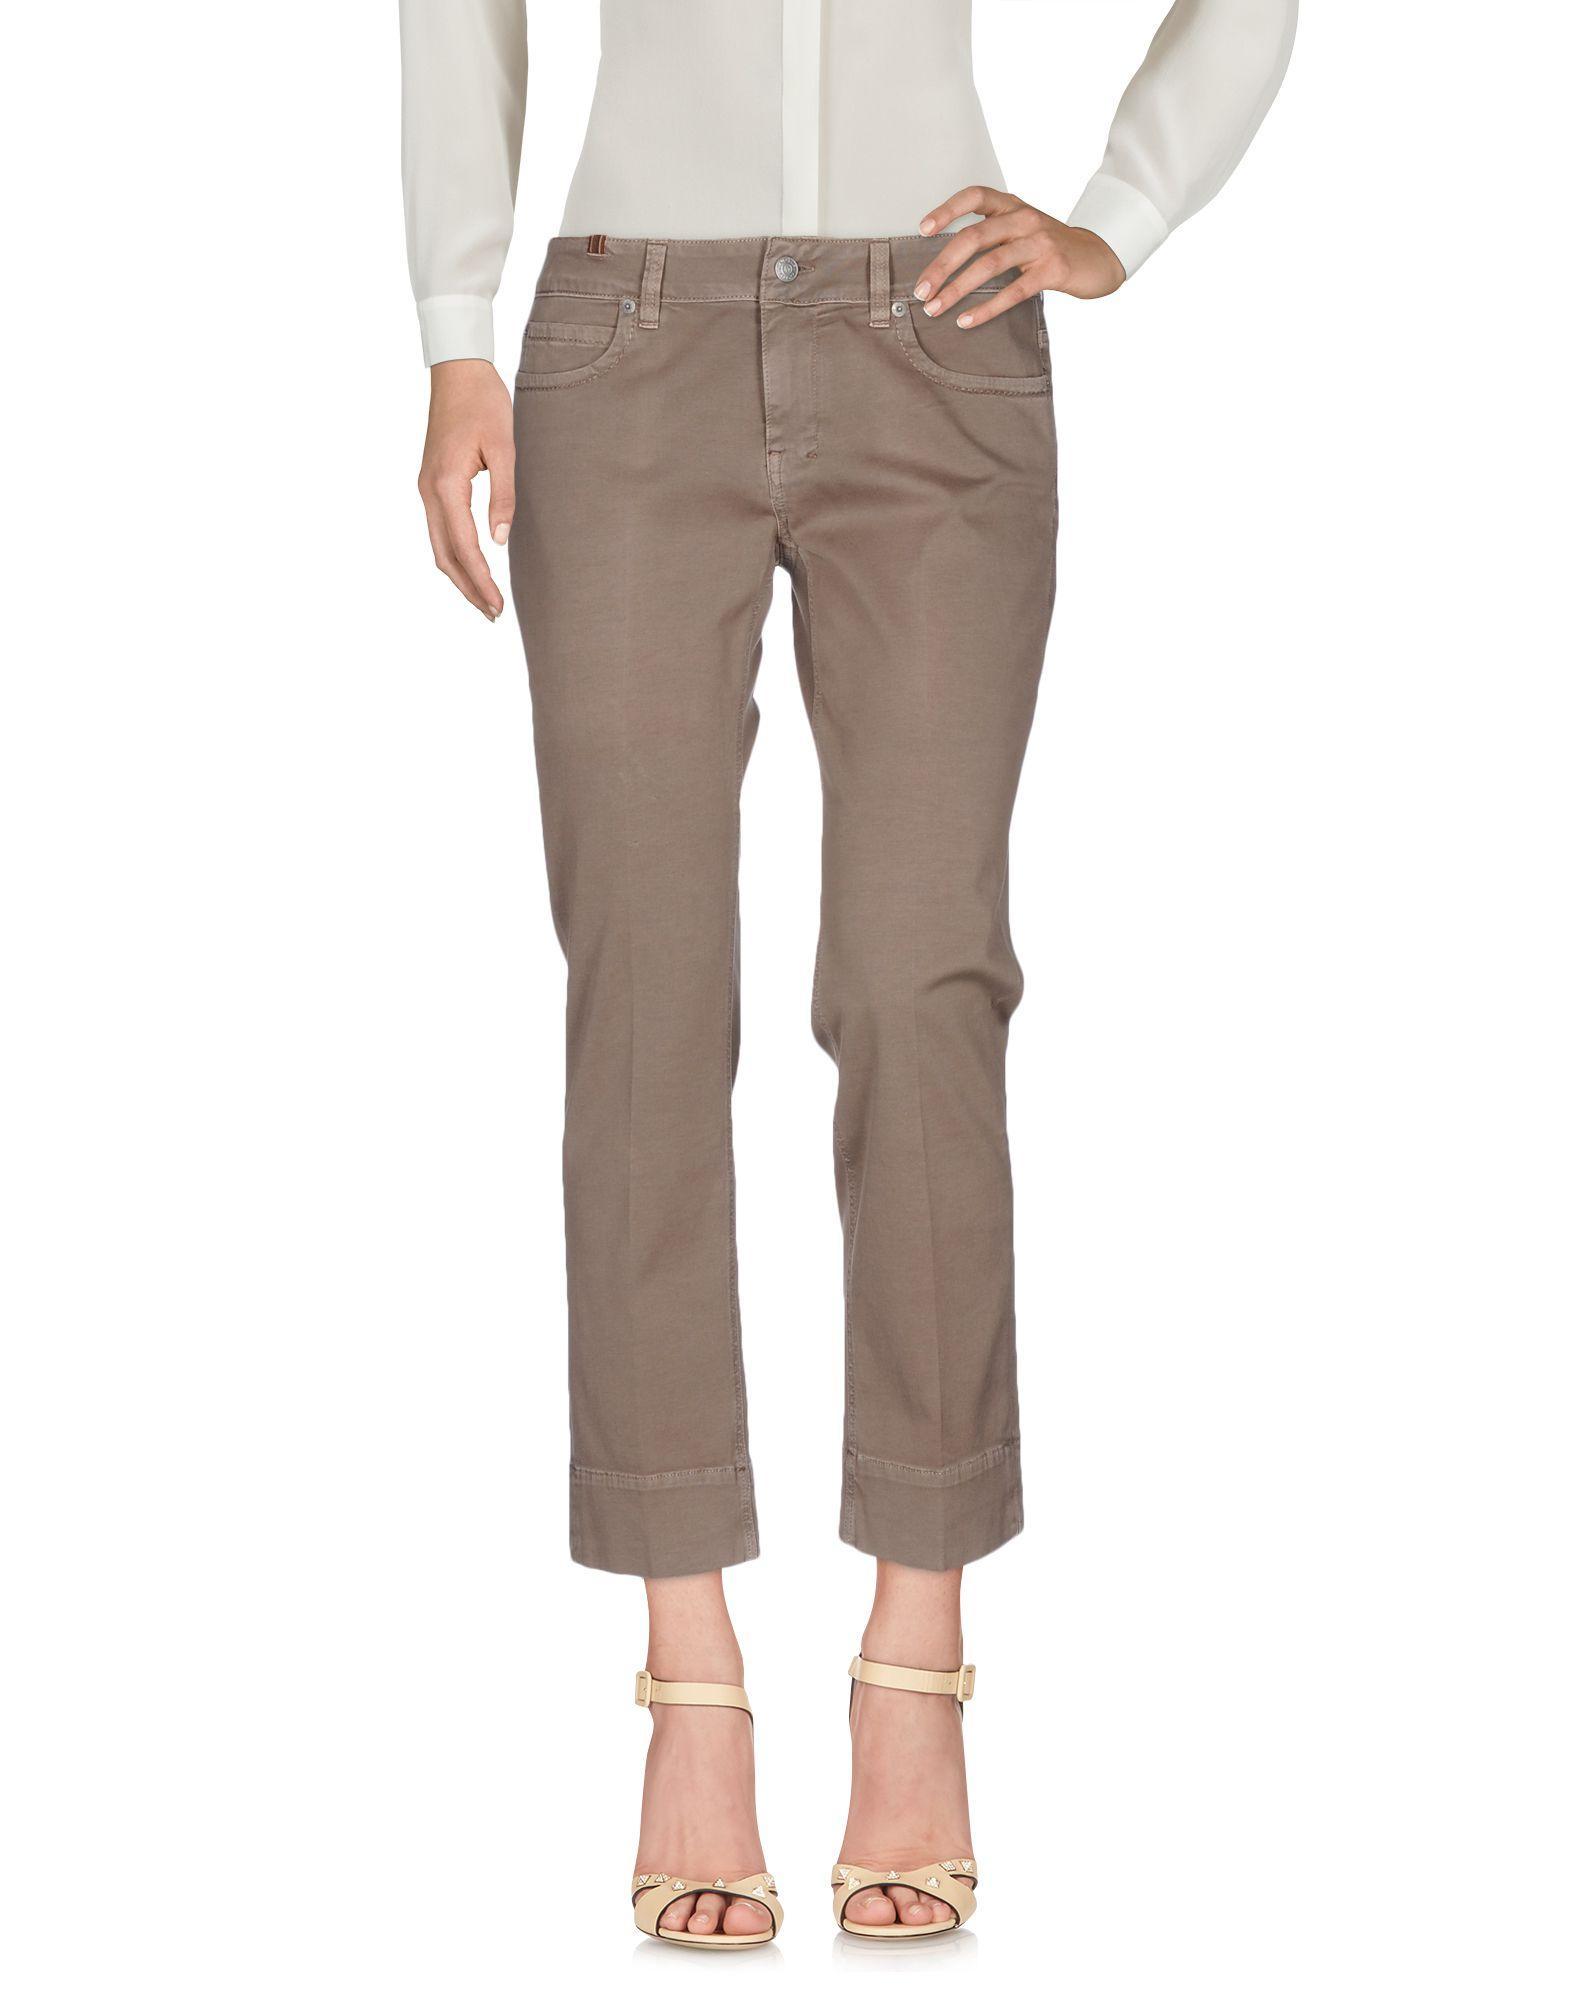 Notify Casual Pants In Khaki